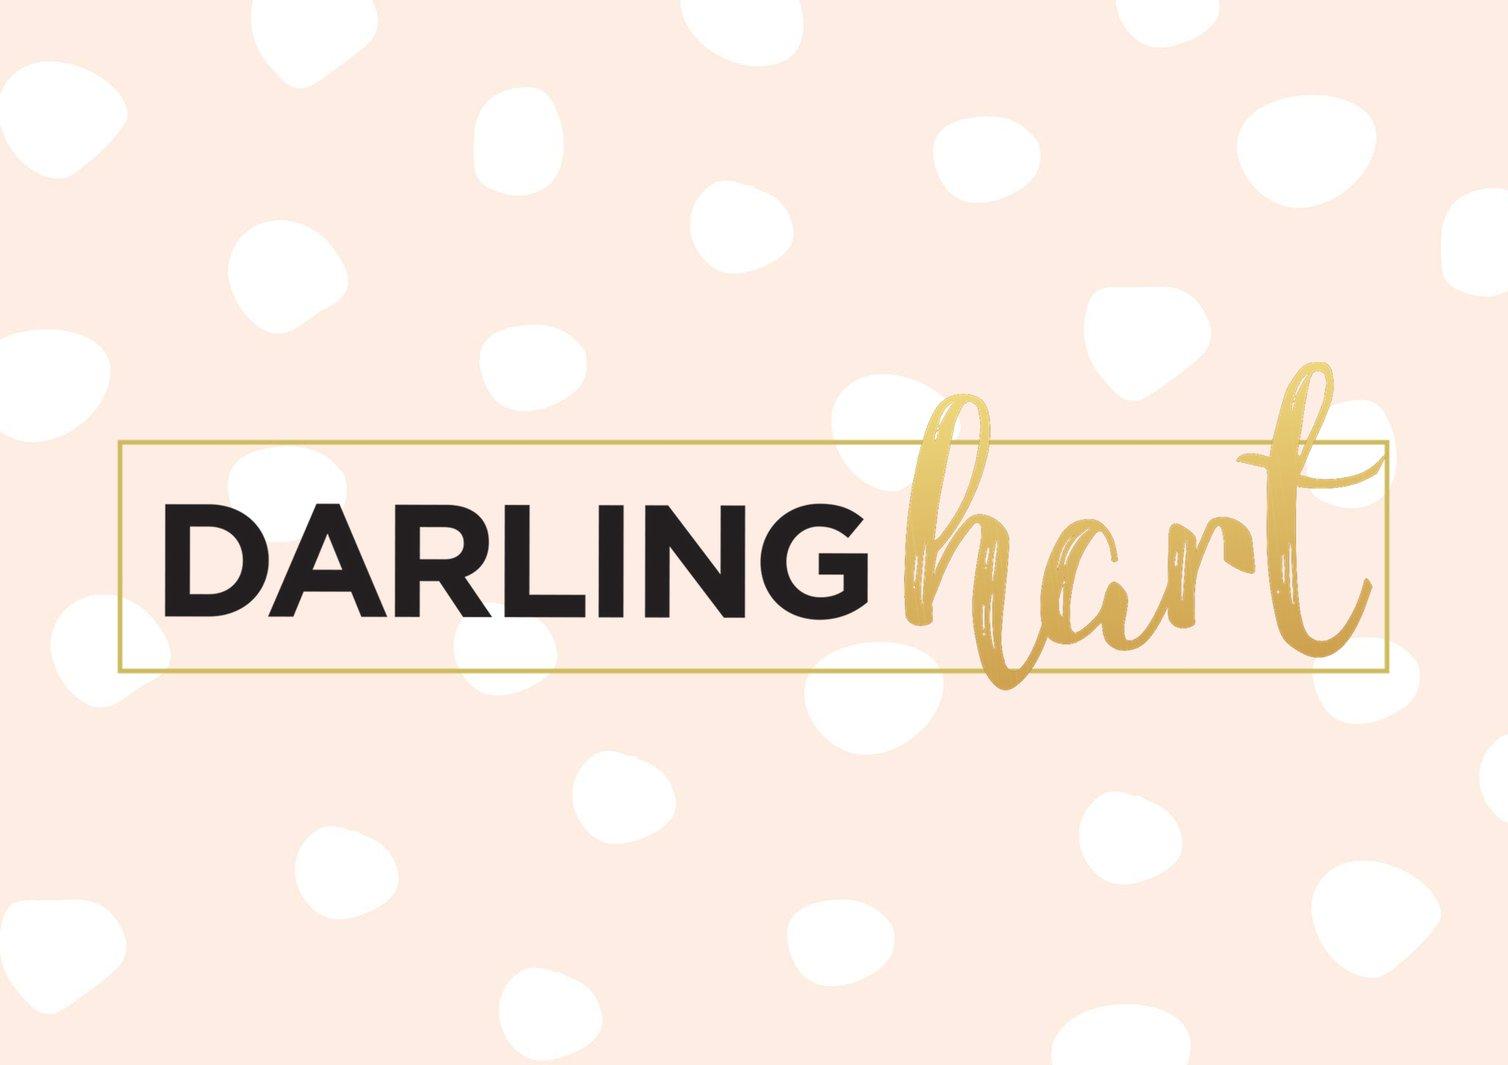 Darling Hart